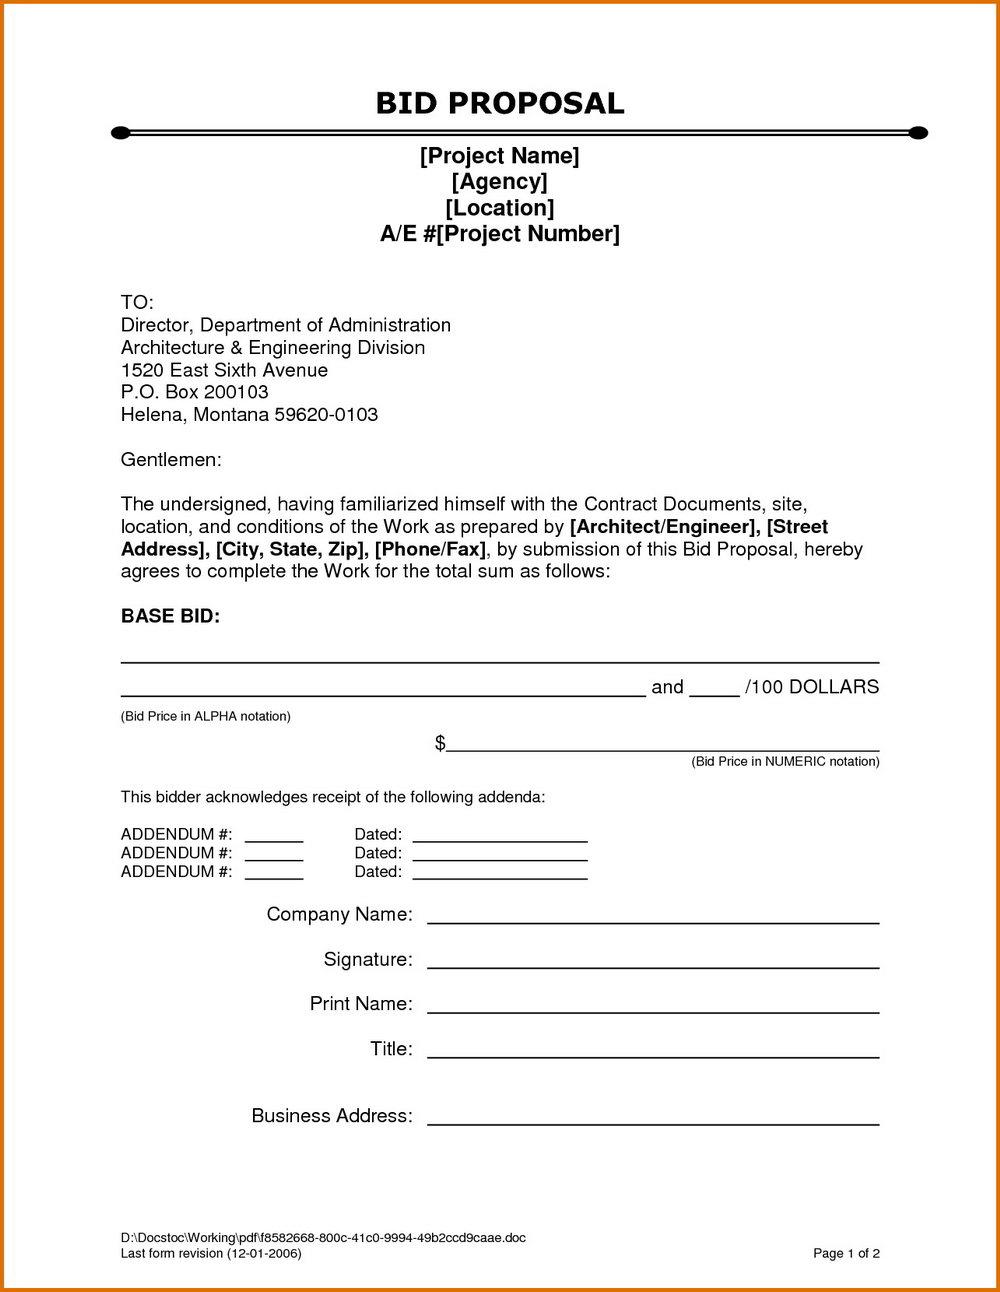 Bid Proposal Form Template